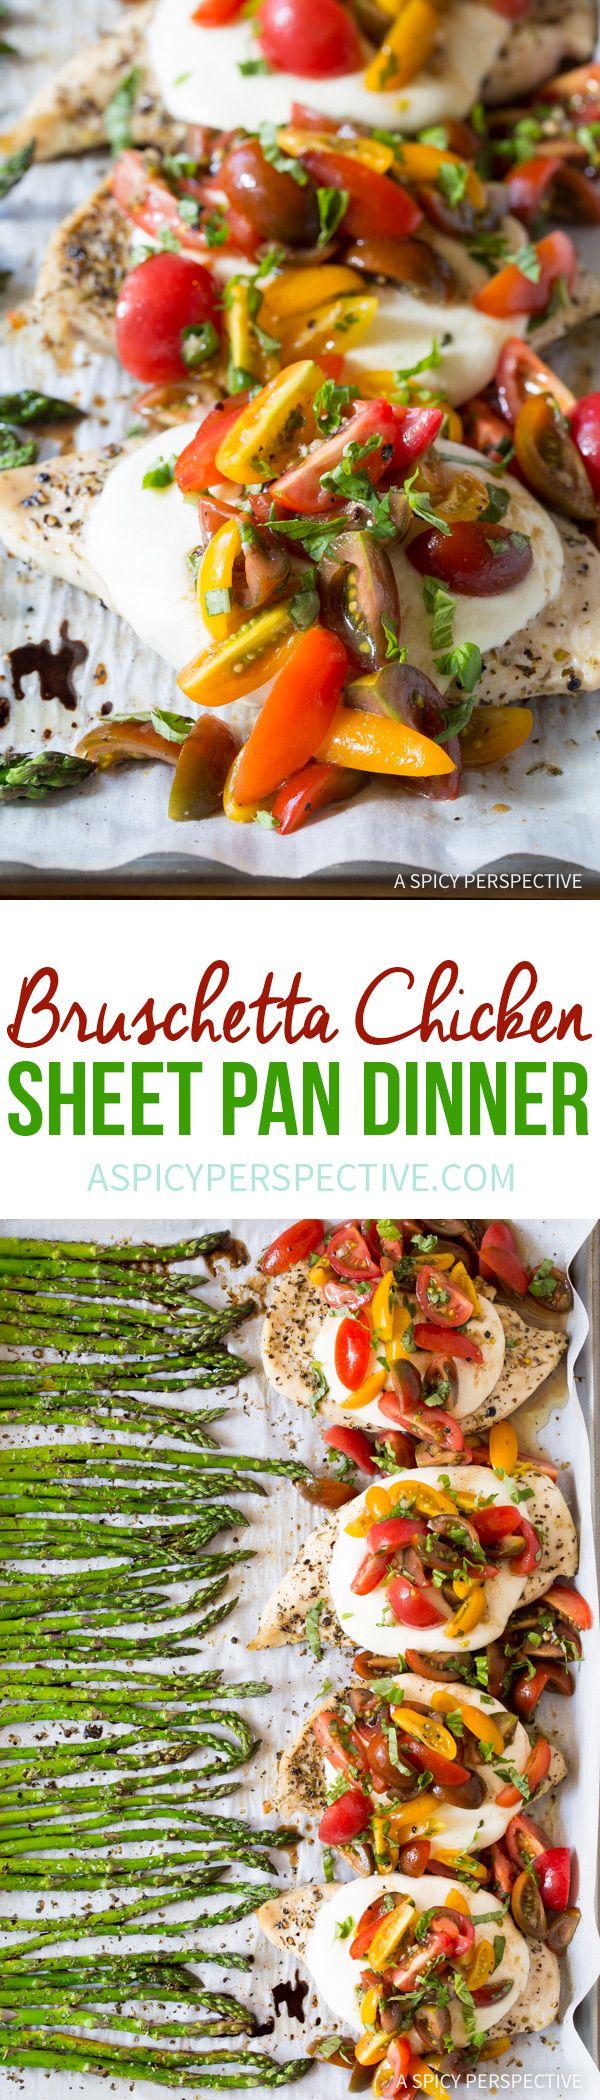 Cheesy Bruschetta Chicken Sheet Pan Dinner Recipe